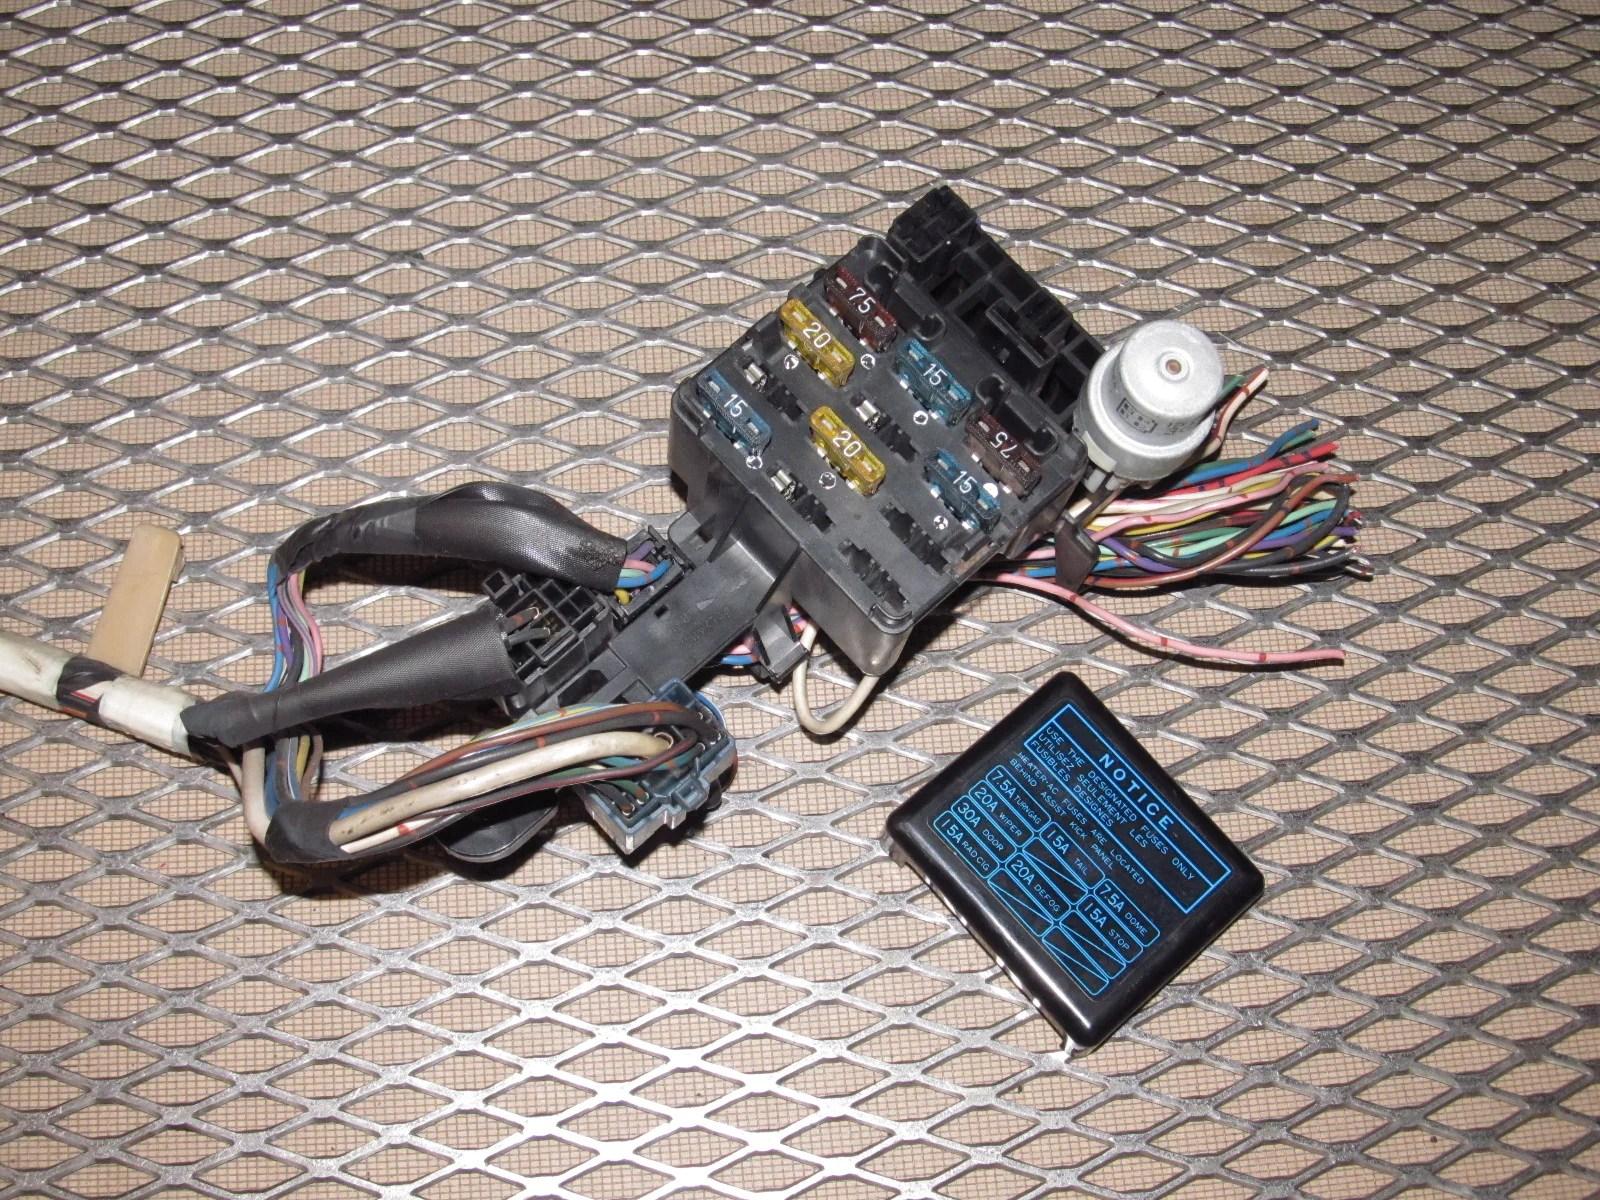 medium resolution of 90 96 300zx interior fuse box relay panel dash wiring diagram host 90 96 300zx interior fuse box relay panel dash